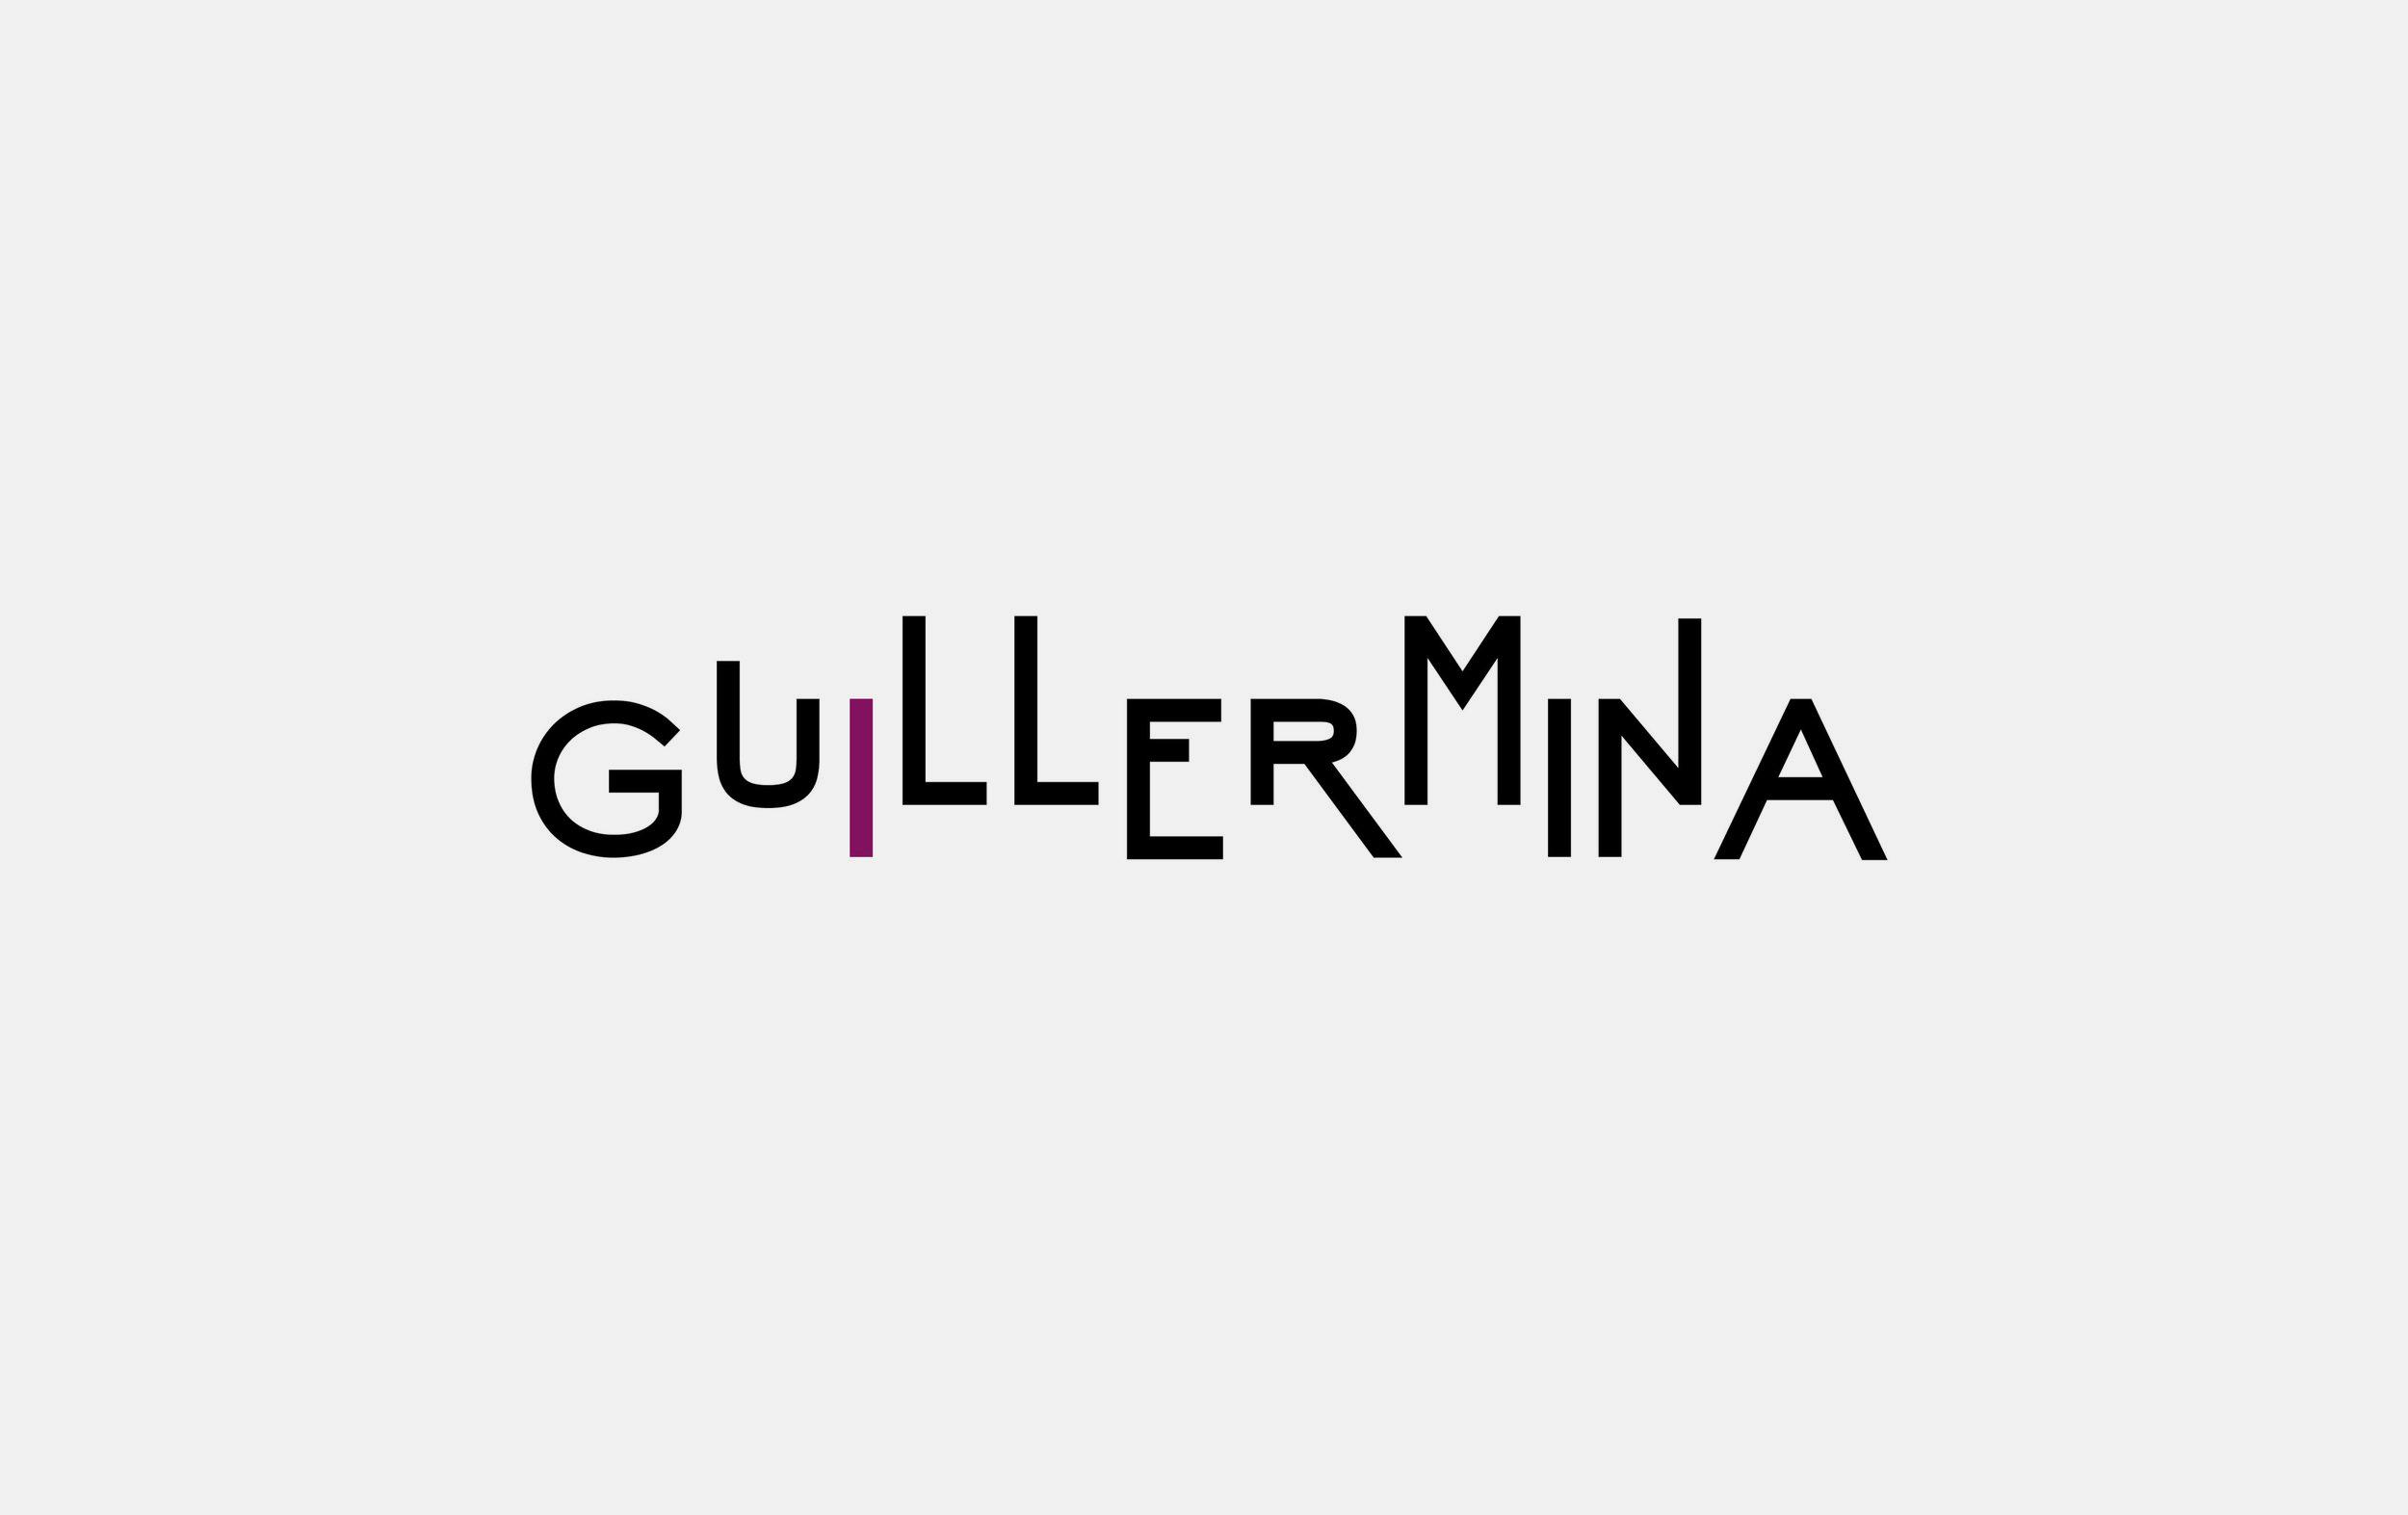 guillermina2.jpg